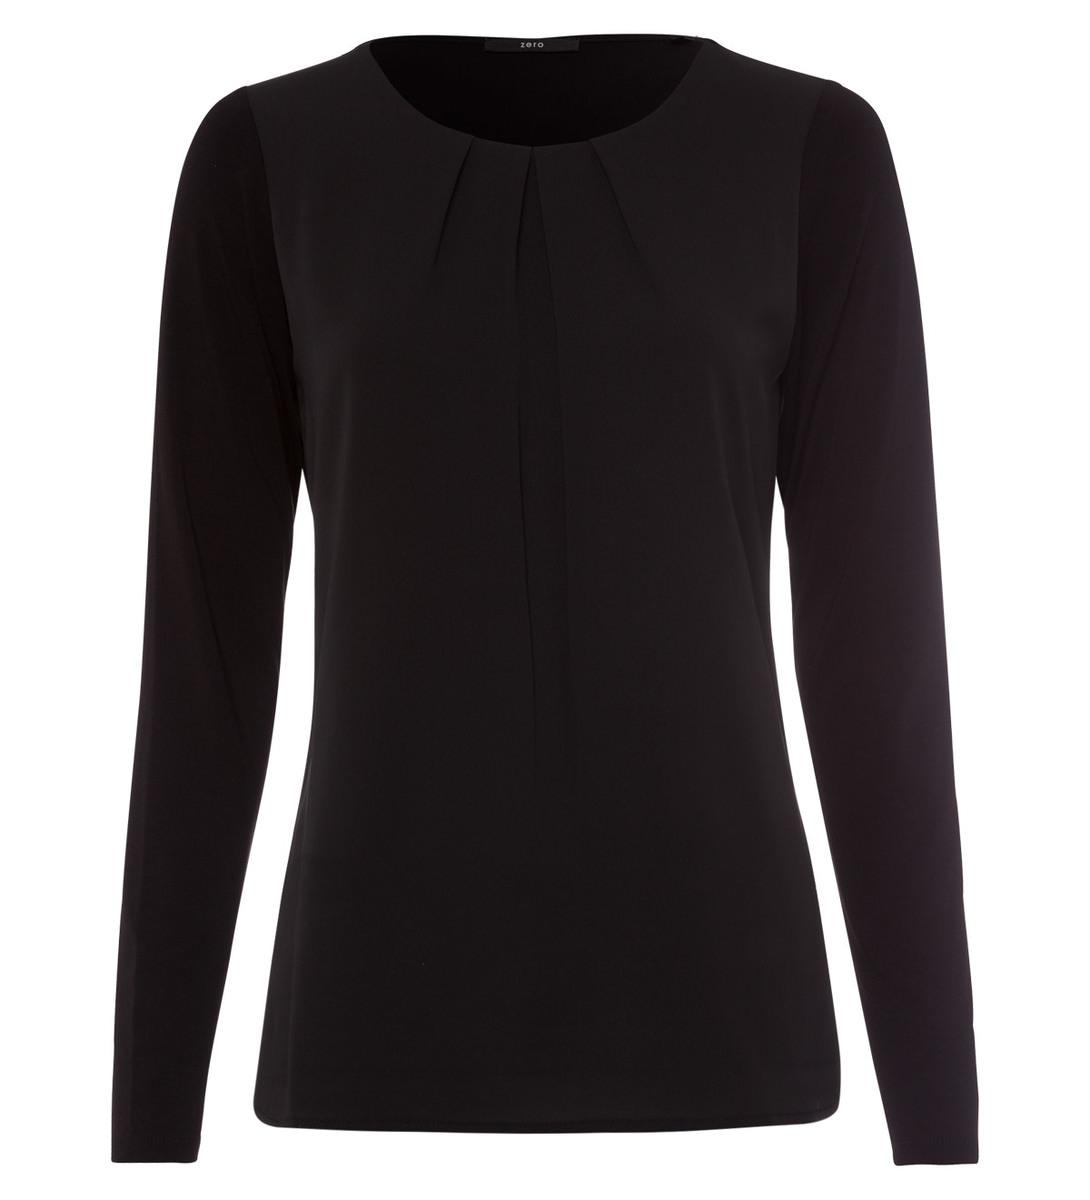 Blusenshirt in black